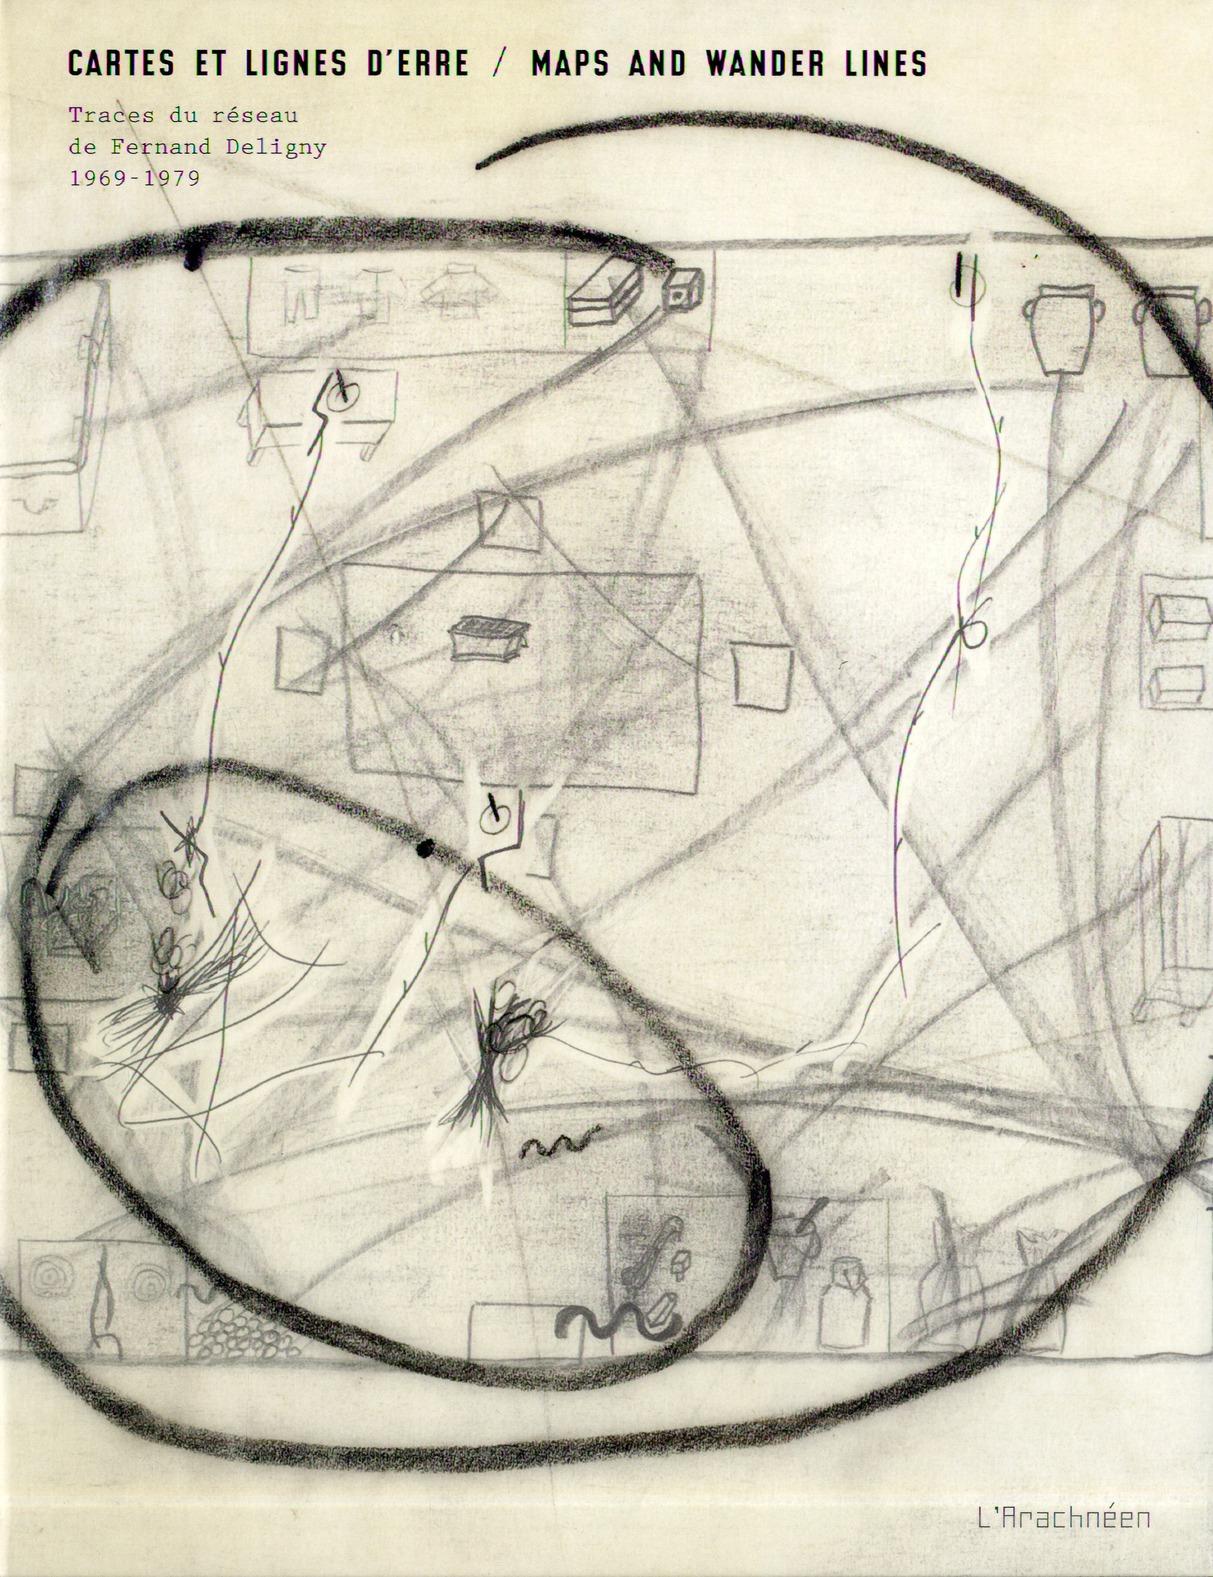 Cartes et lignes d'erre ; maps and wander lines